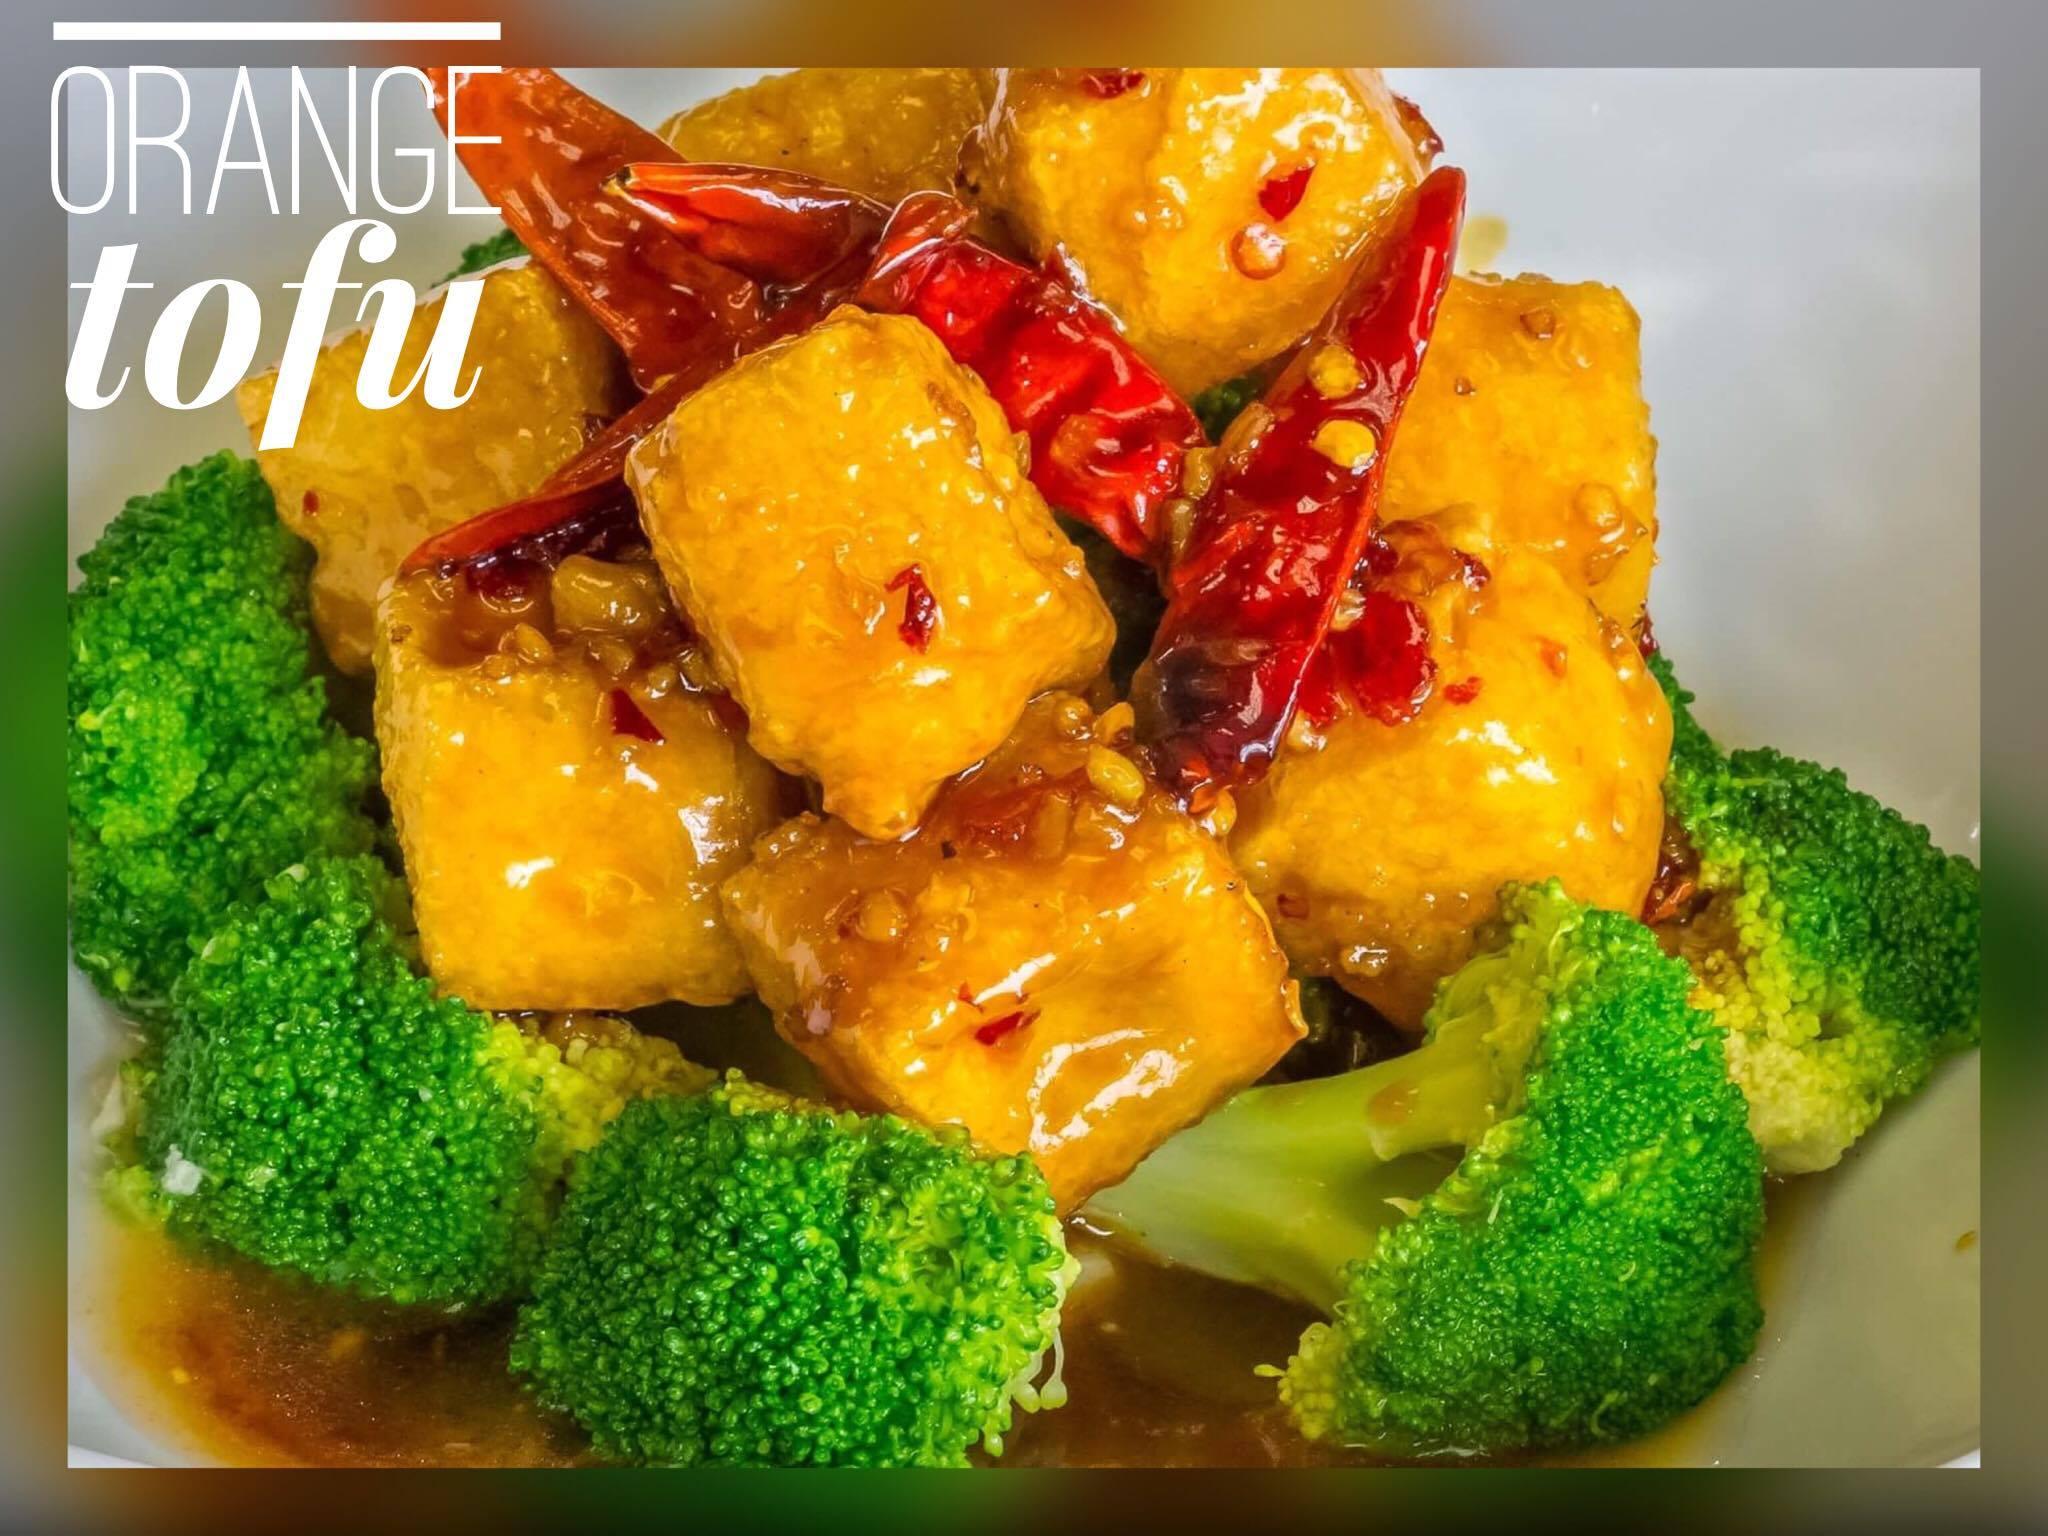 orange tofu.jpg